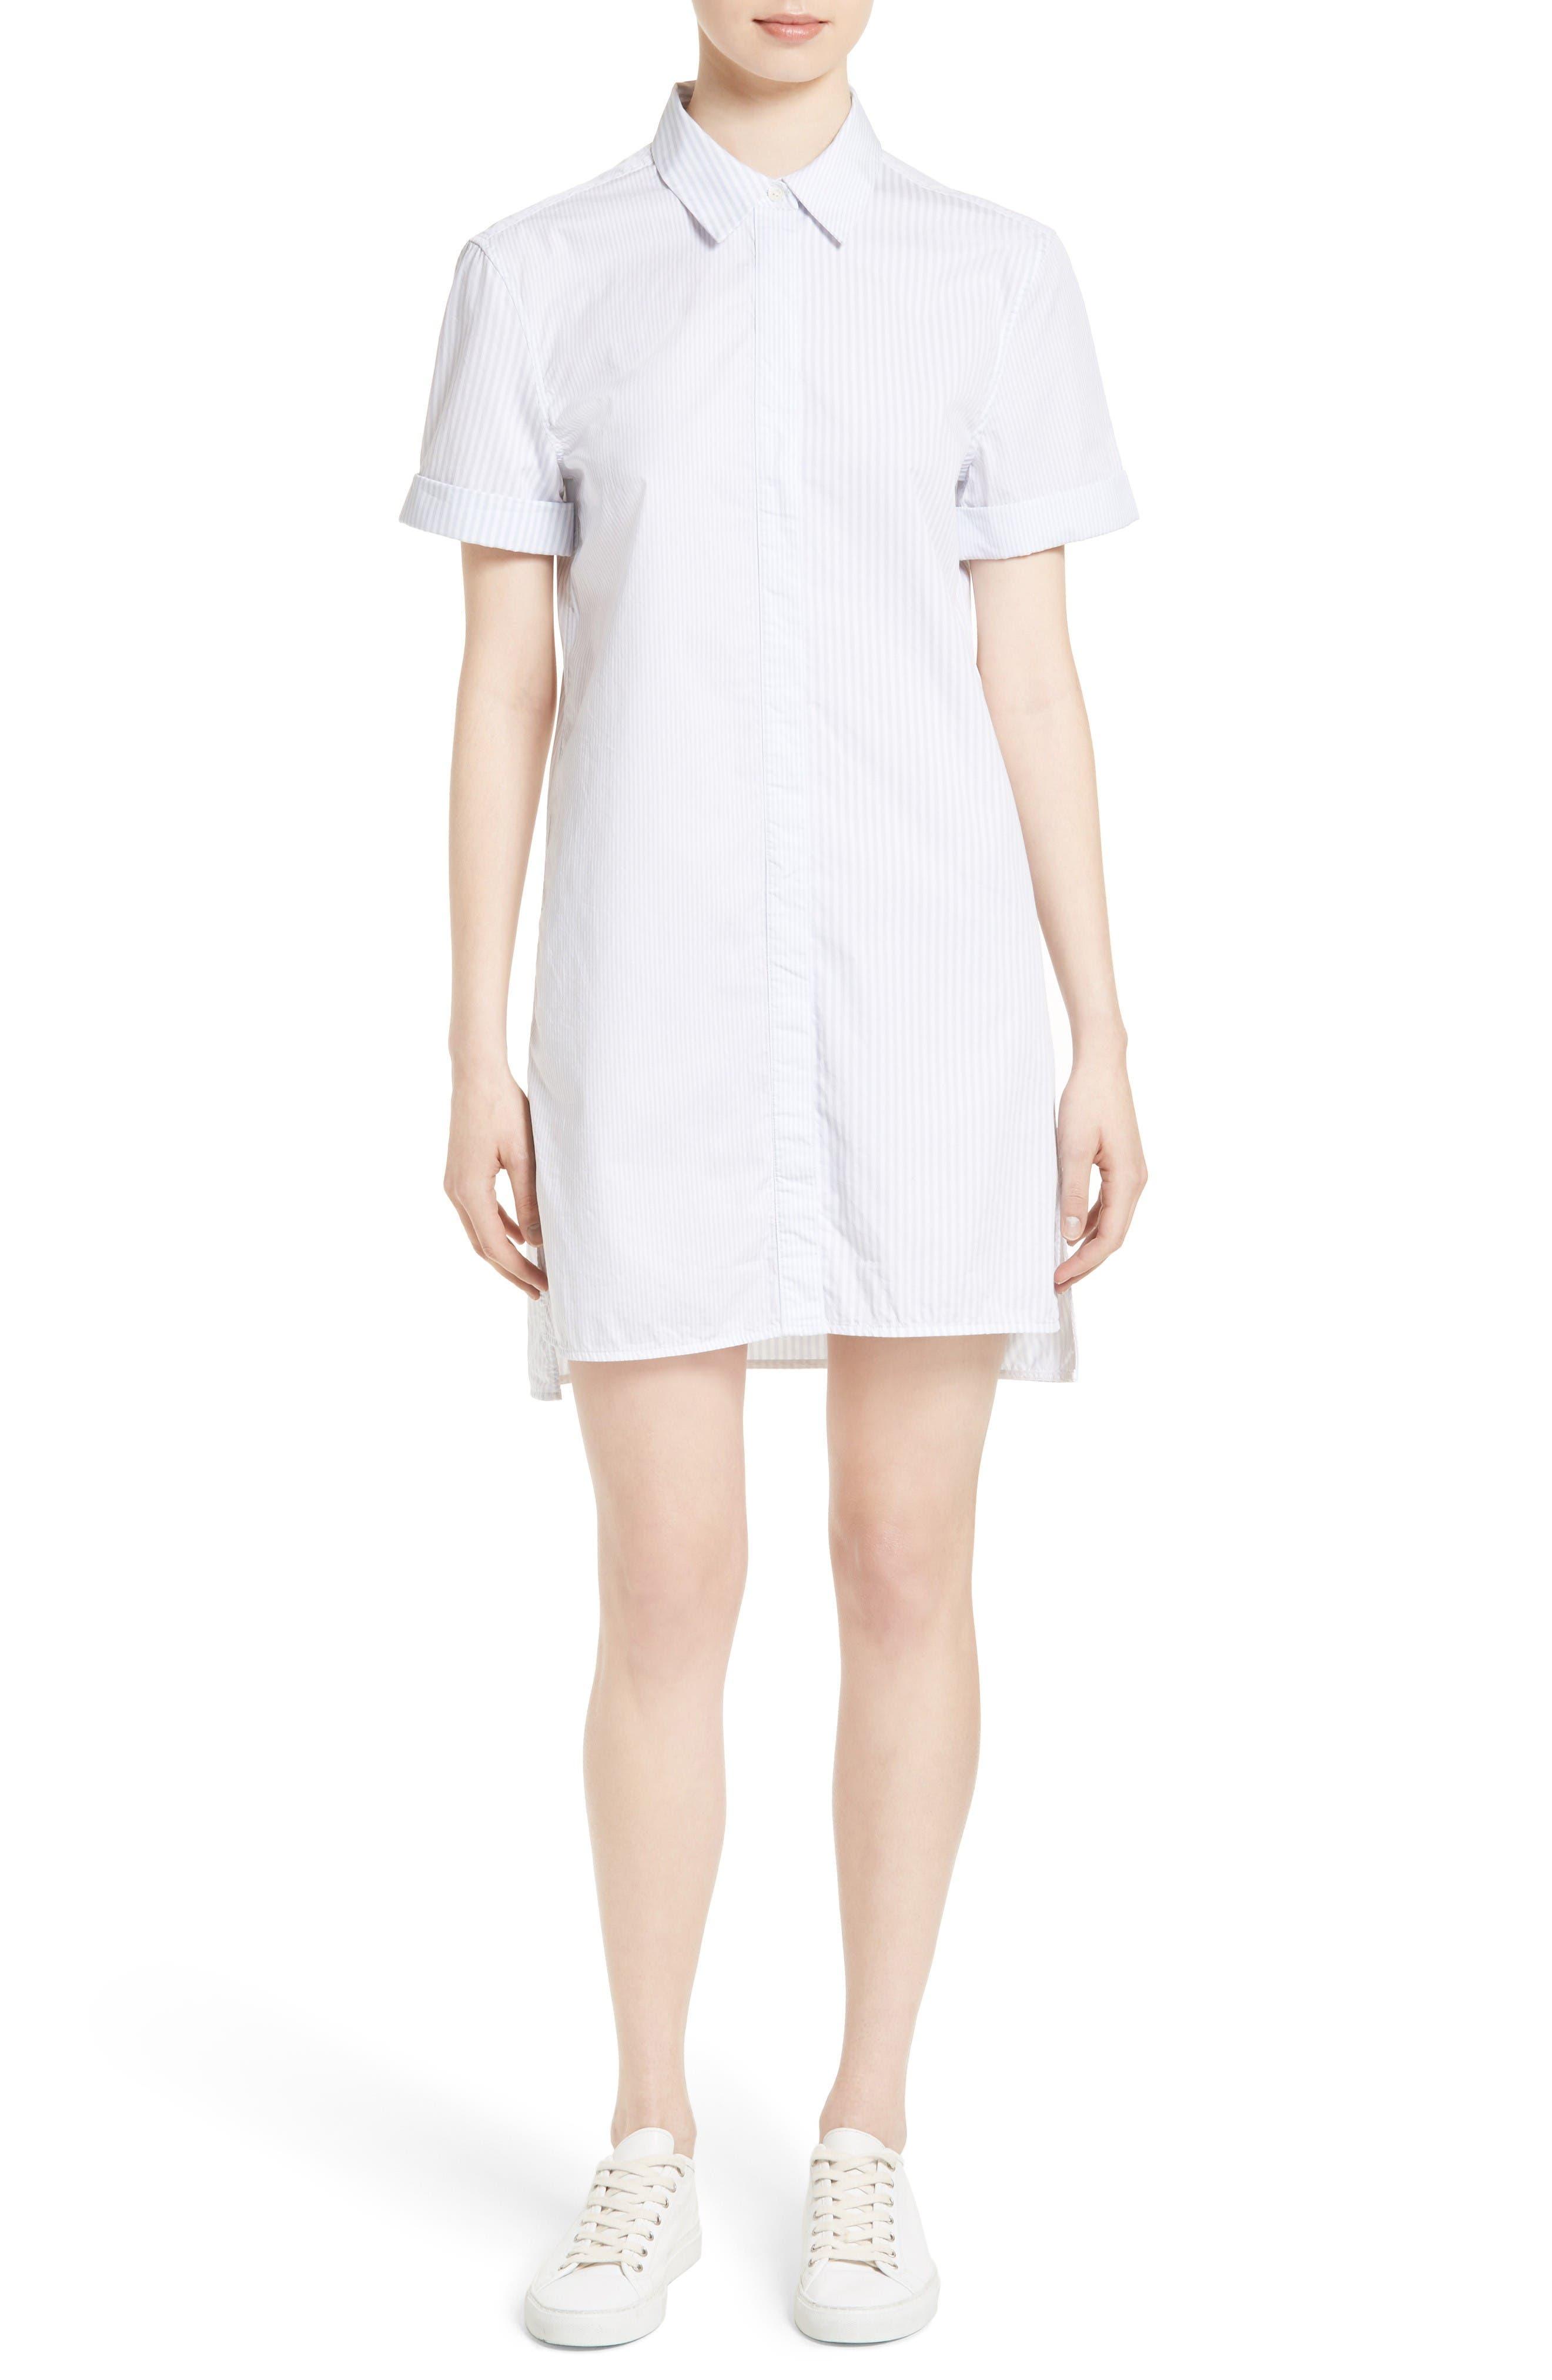 Mirelle Stripe Cotton Shirtdress,                             Main thumbnail 1, color,                             Bt Wht-Bri